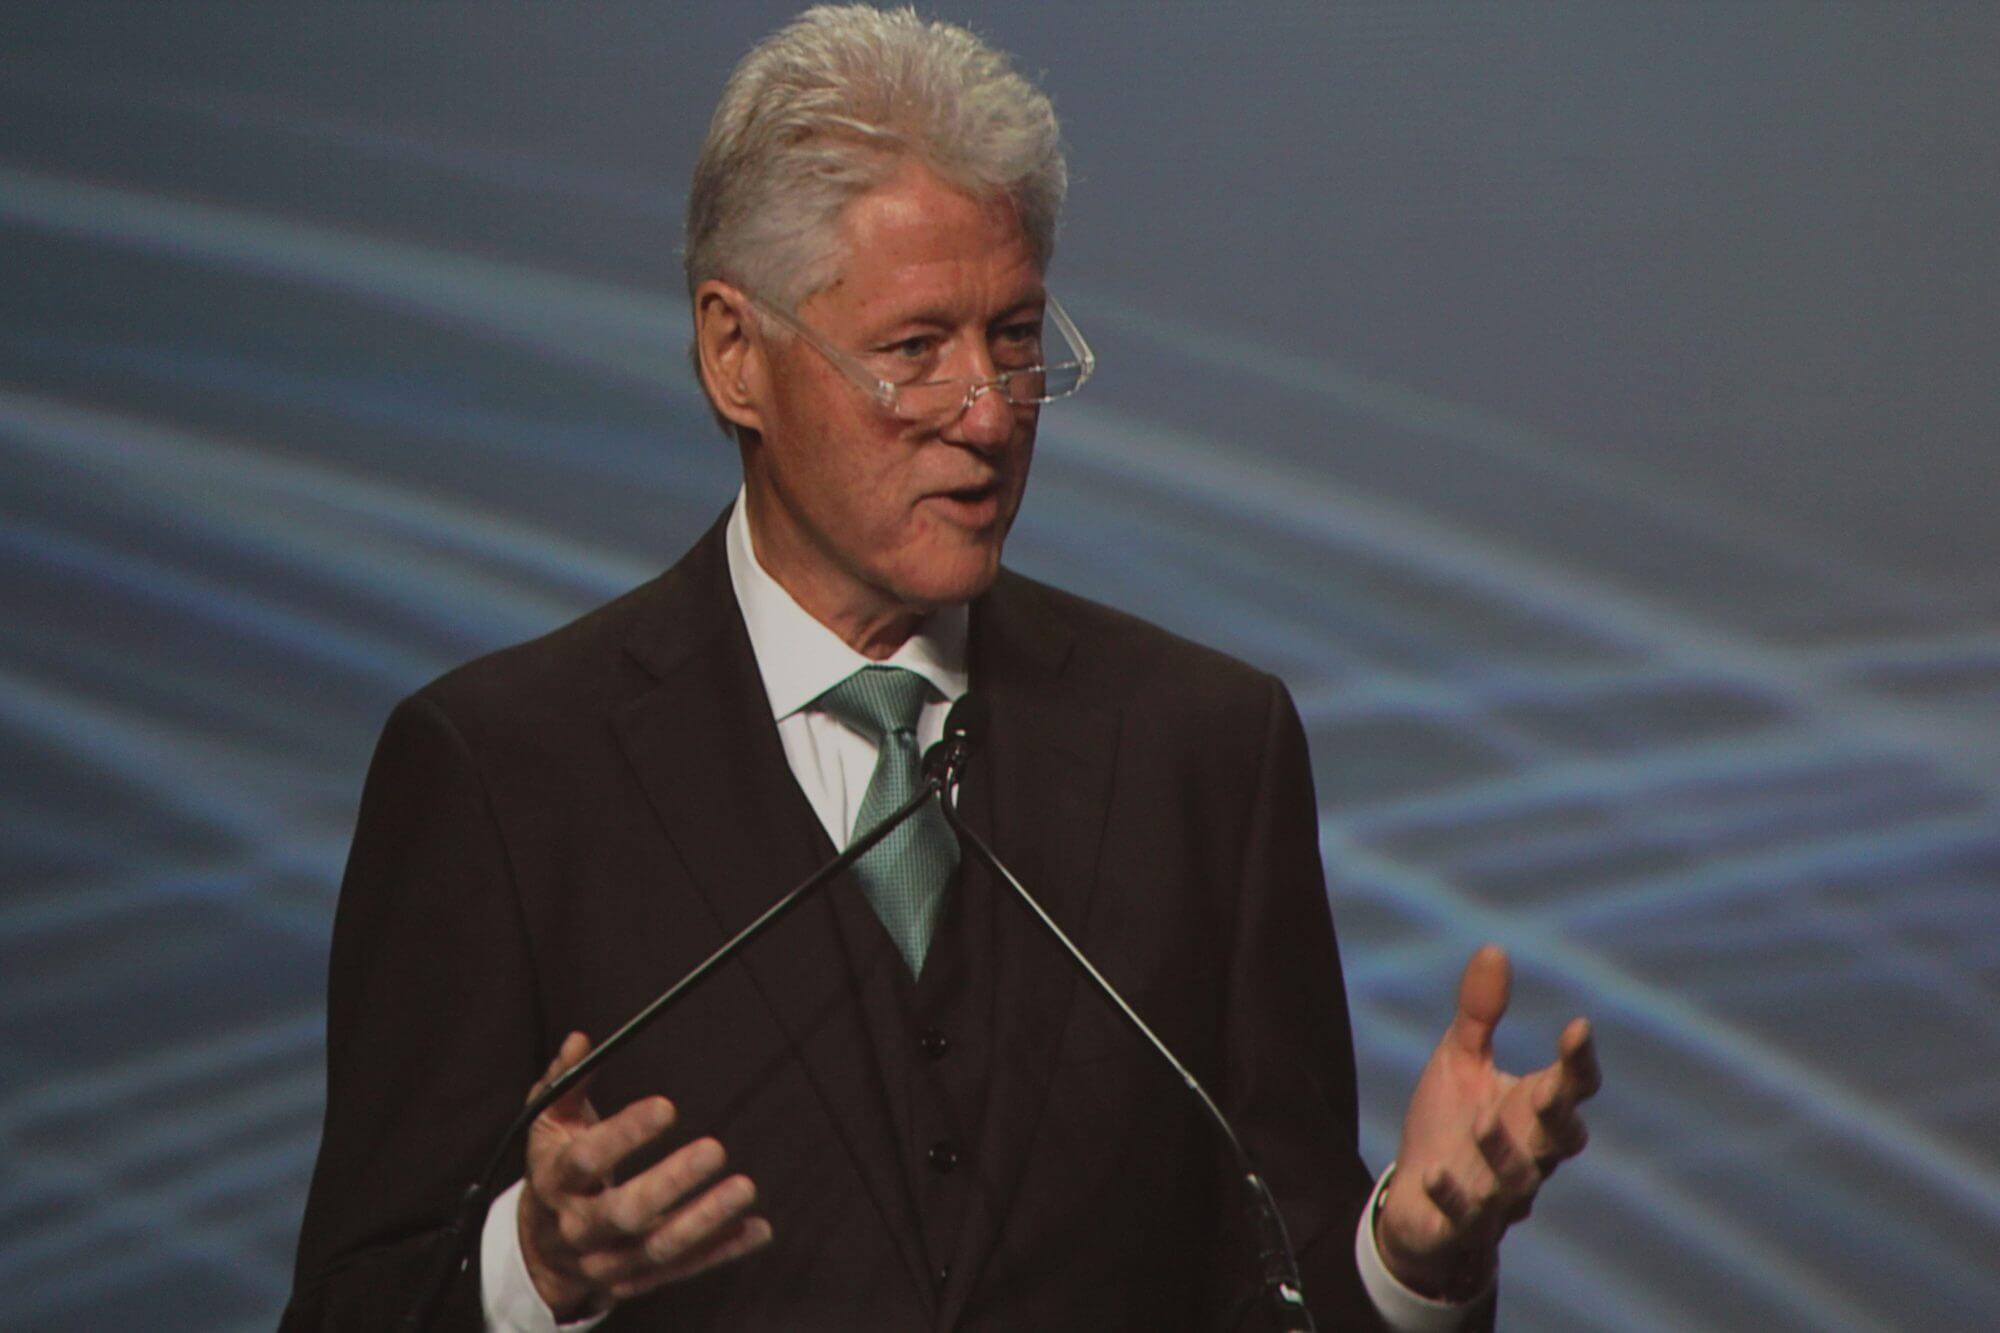 President Clinton: Energy efficiency should be America's headline